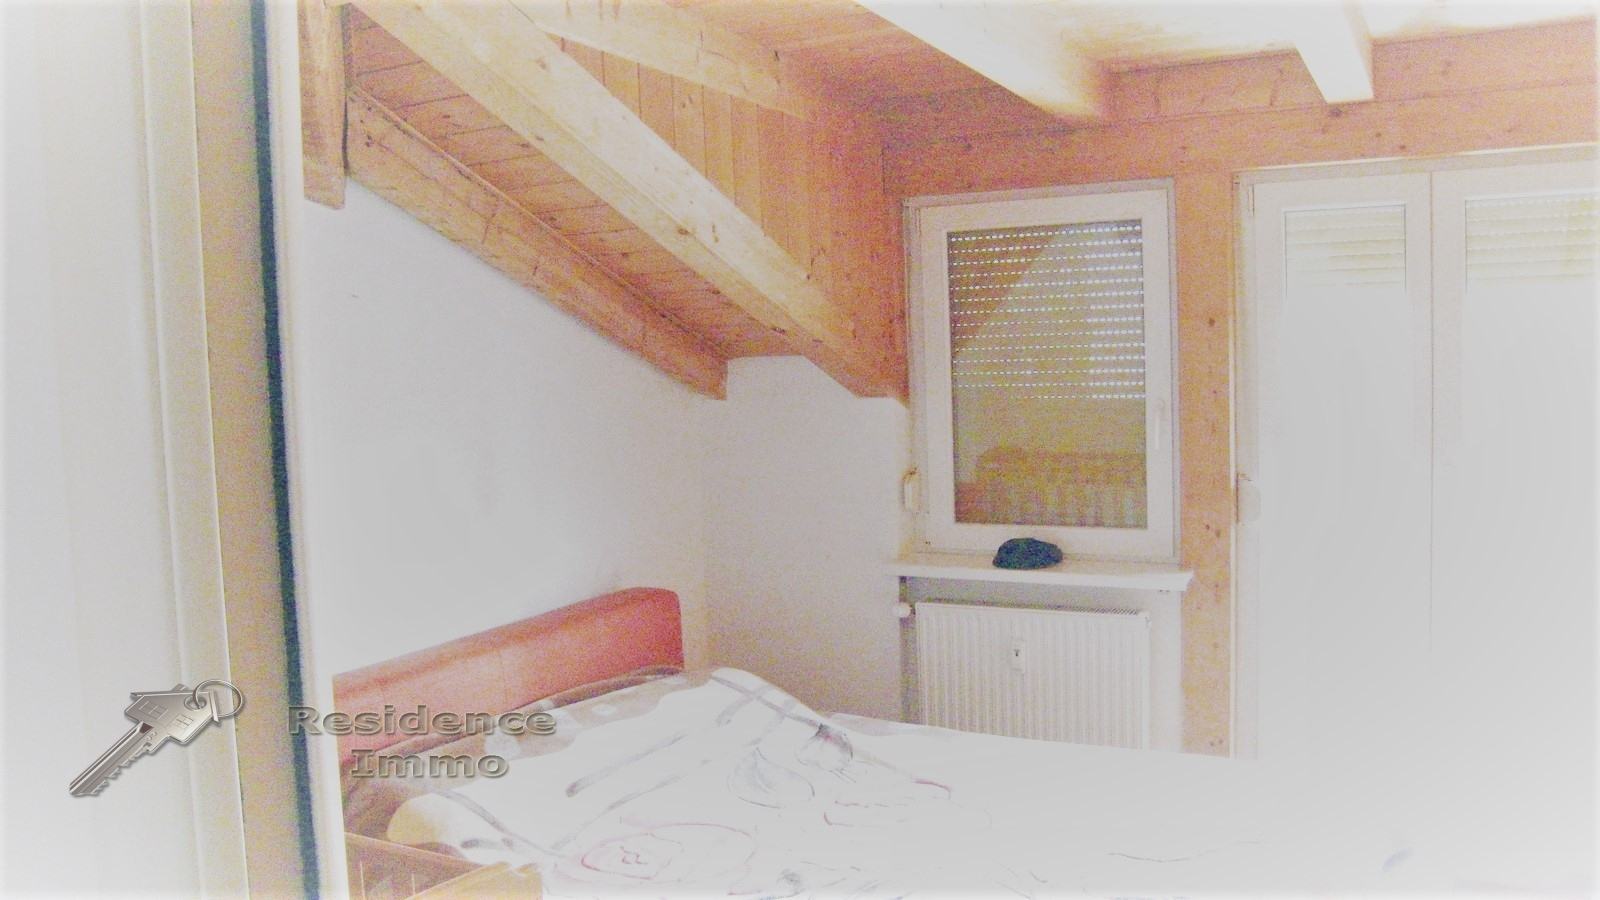 wohnung attika kaufen in bolzano bozen kodex 2202. Black Bedroom Furniture Sets. Home Design Ideas